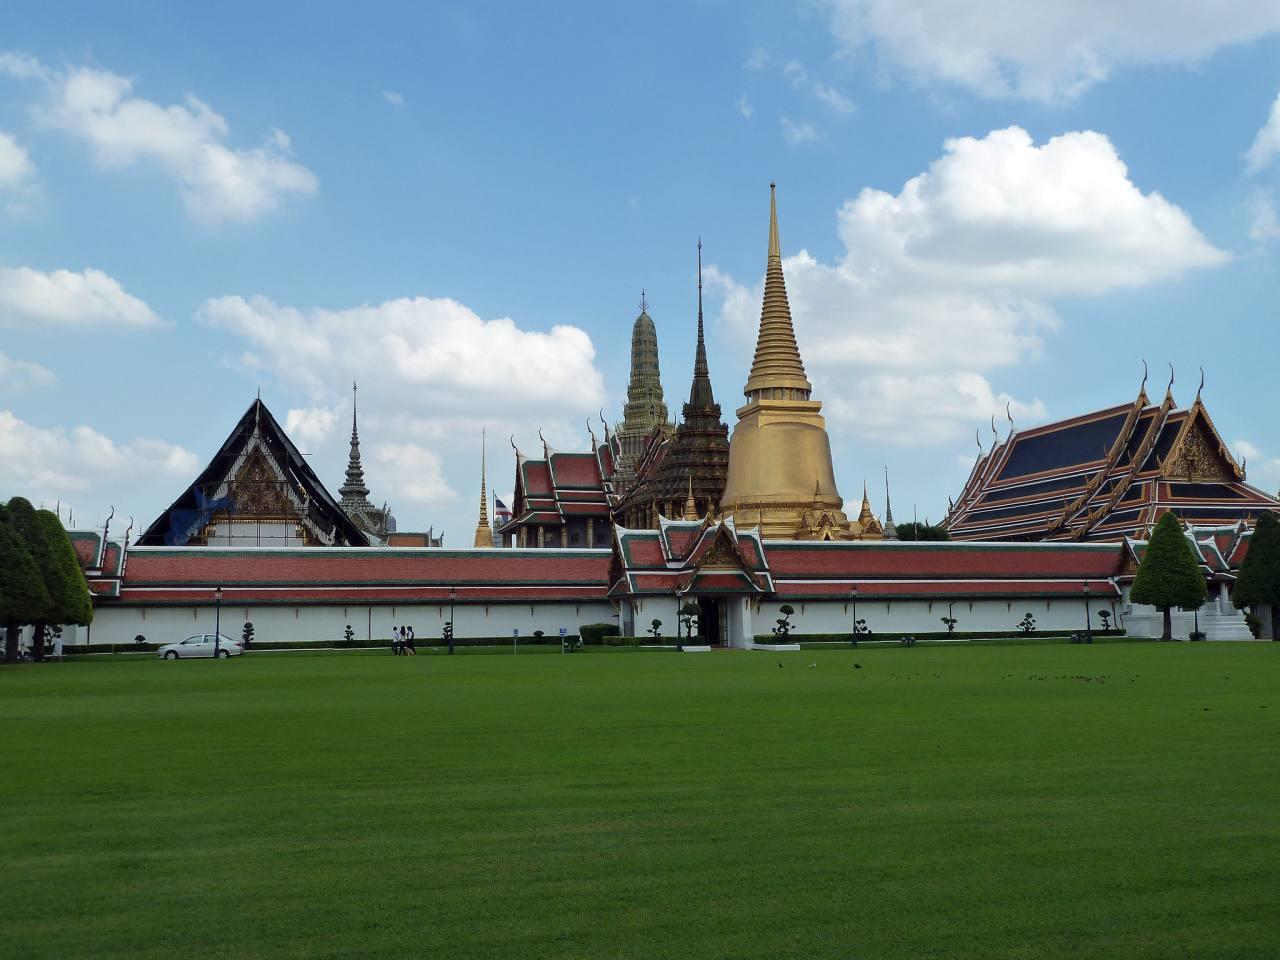 Grand Palace & Wat Pra Kaew, Top tourist attractions in Bangkok